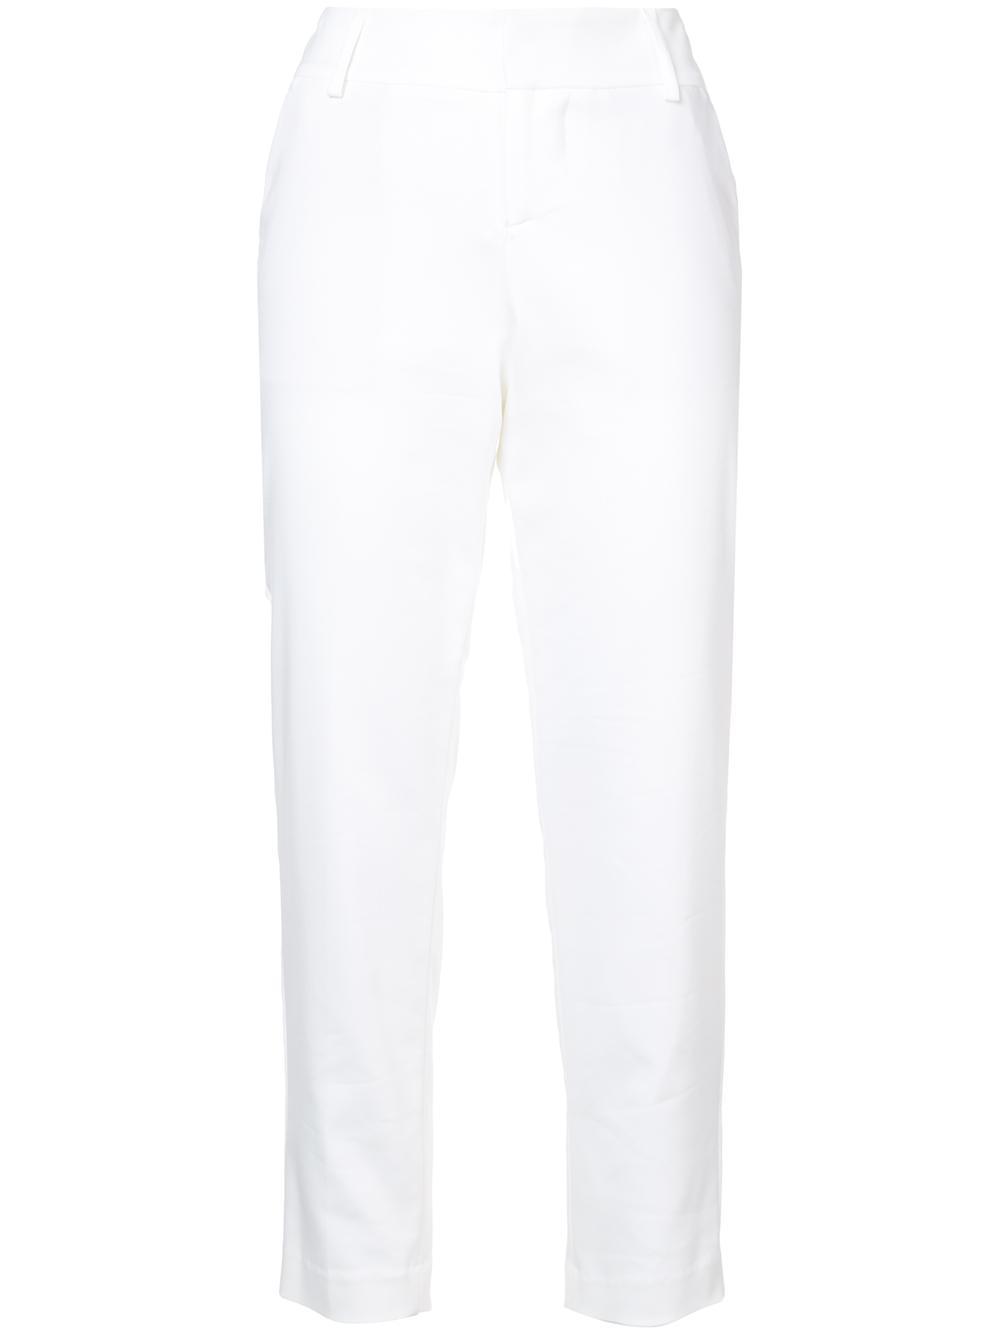 Stacey Slim Trouser Item # W000113198